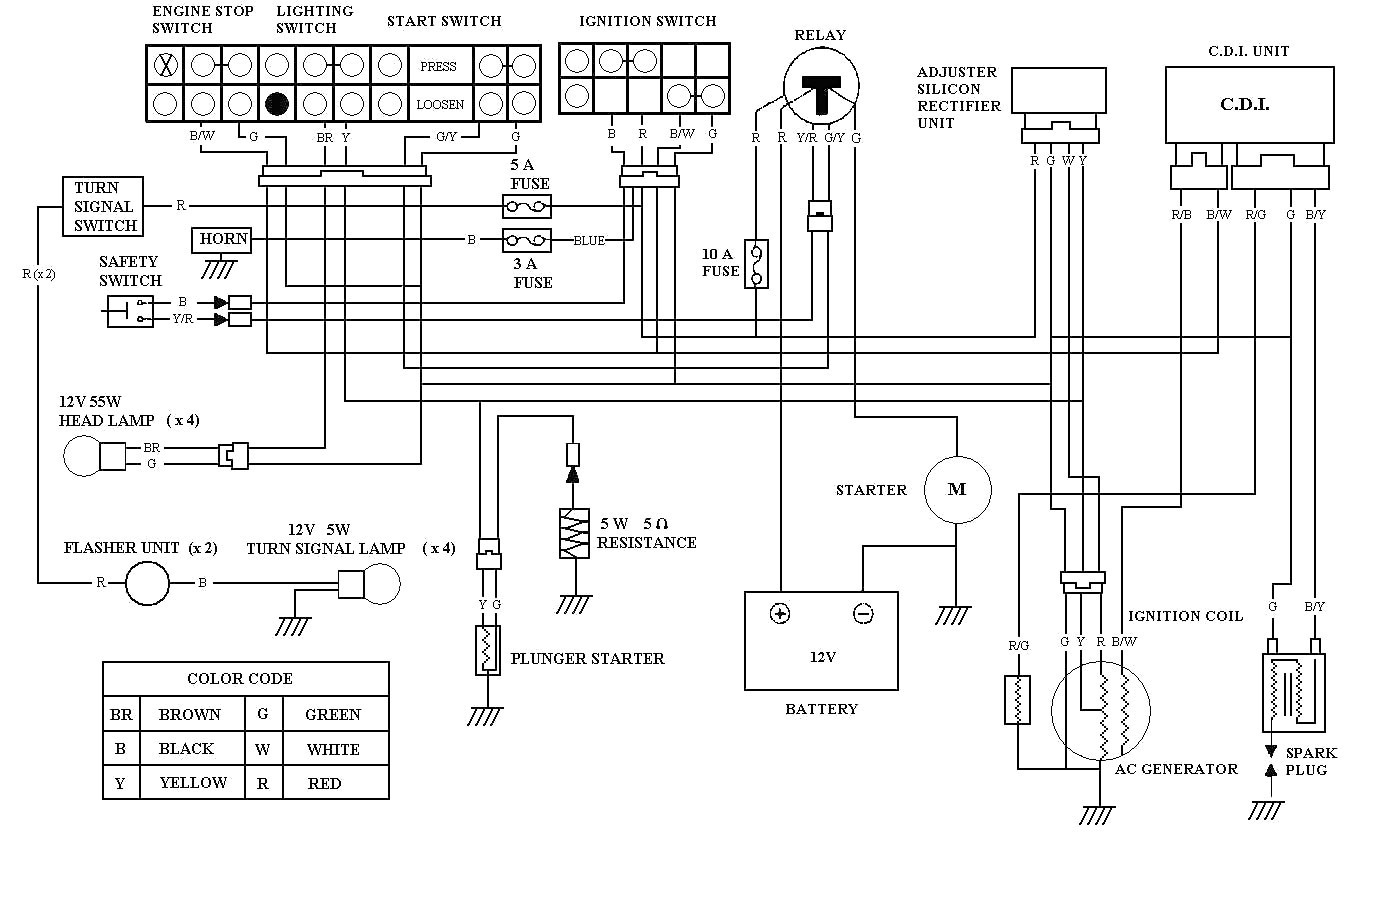 [DIAGRAM] Honda Xlr 125 R Wiring Diagram FULL Version HD